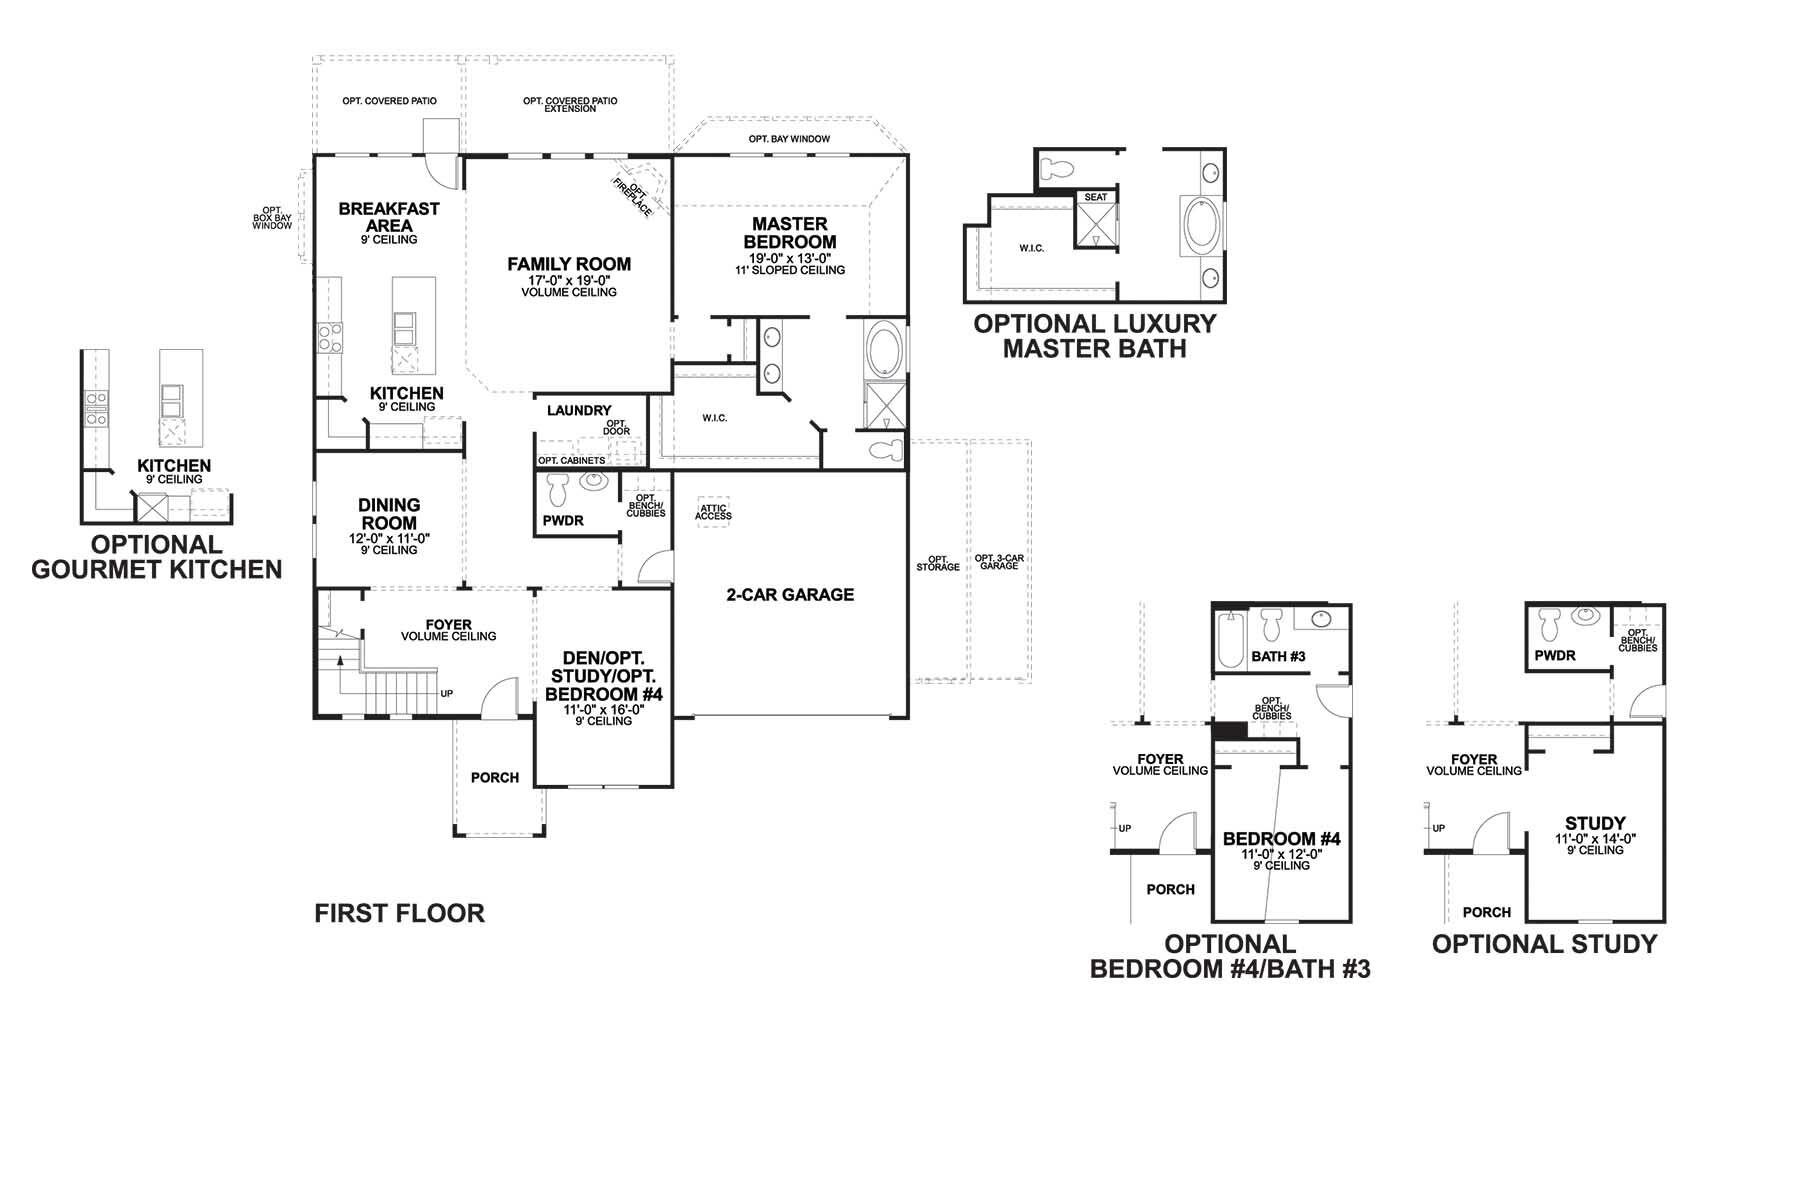 Zacate First Floor